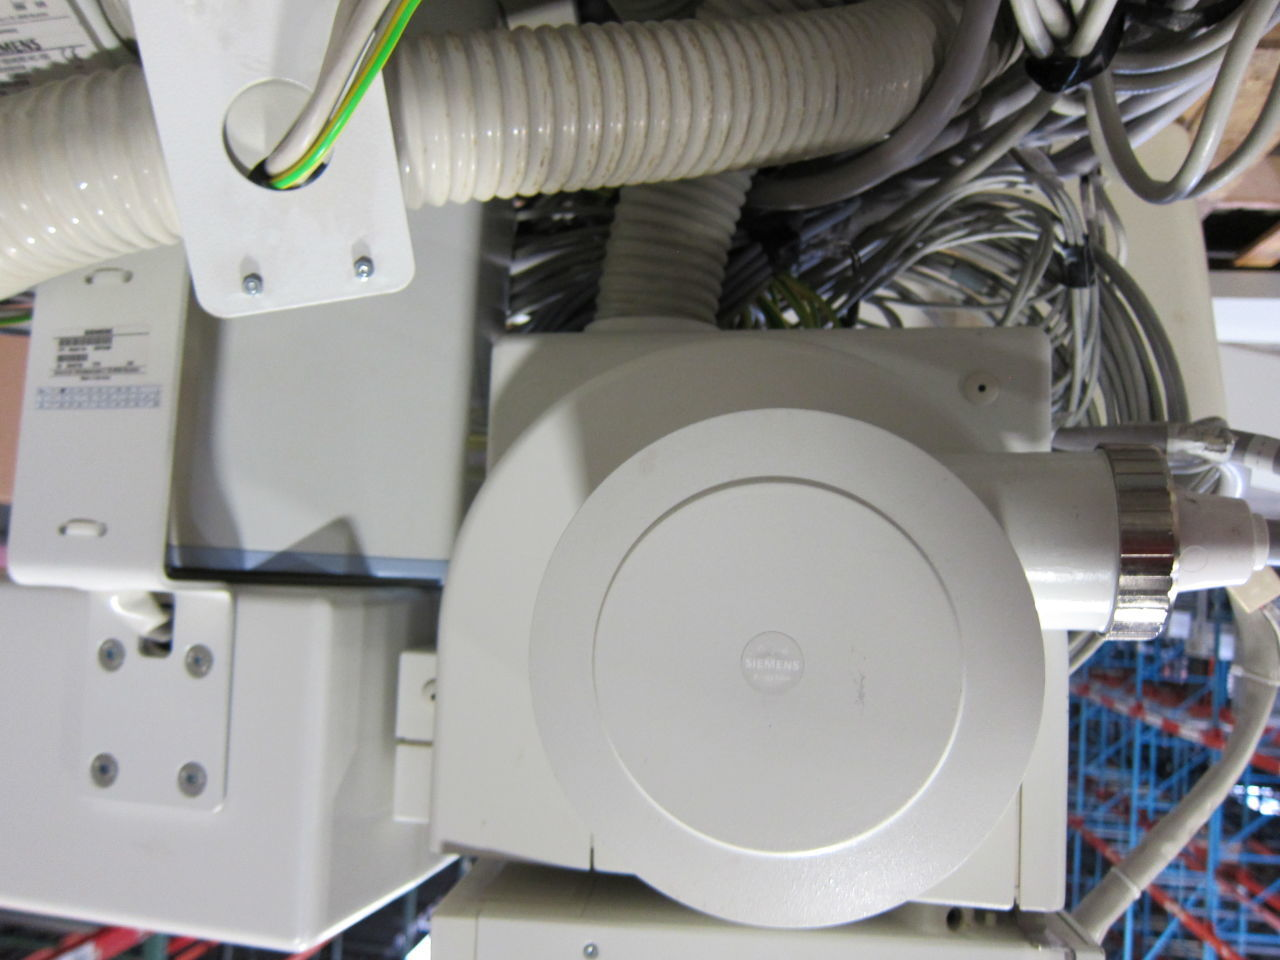 SIEMENS Axiom Sireskop SD S3,  Polydoros SX65  Digital Pediatric Rad/Fluoro Room